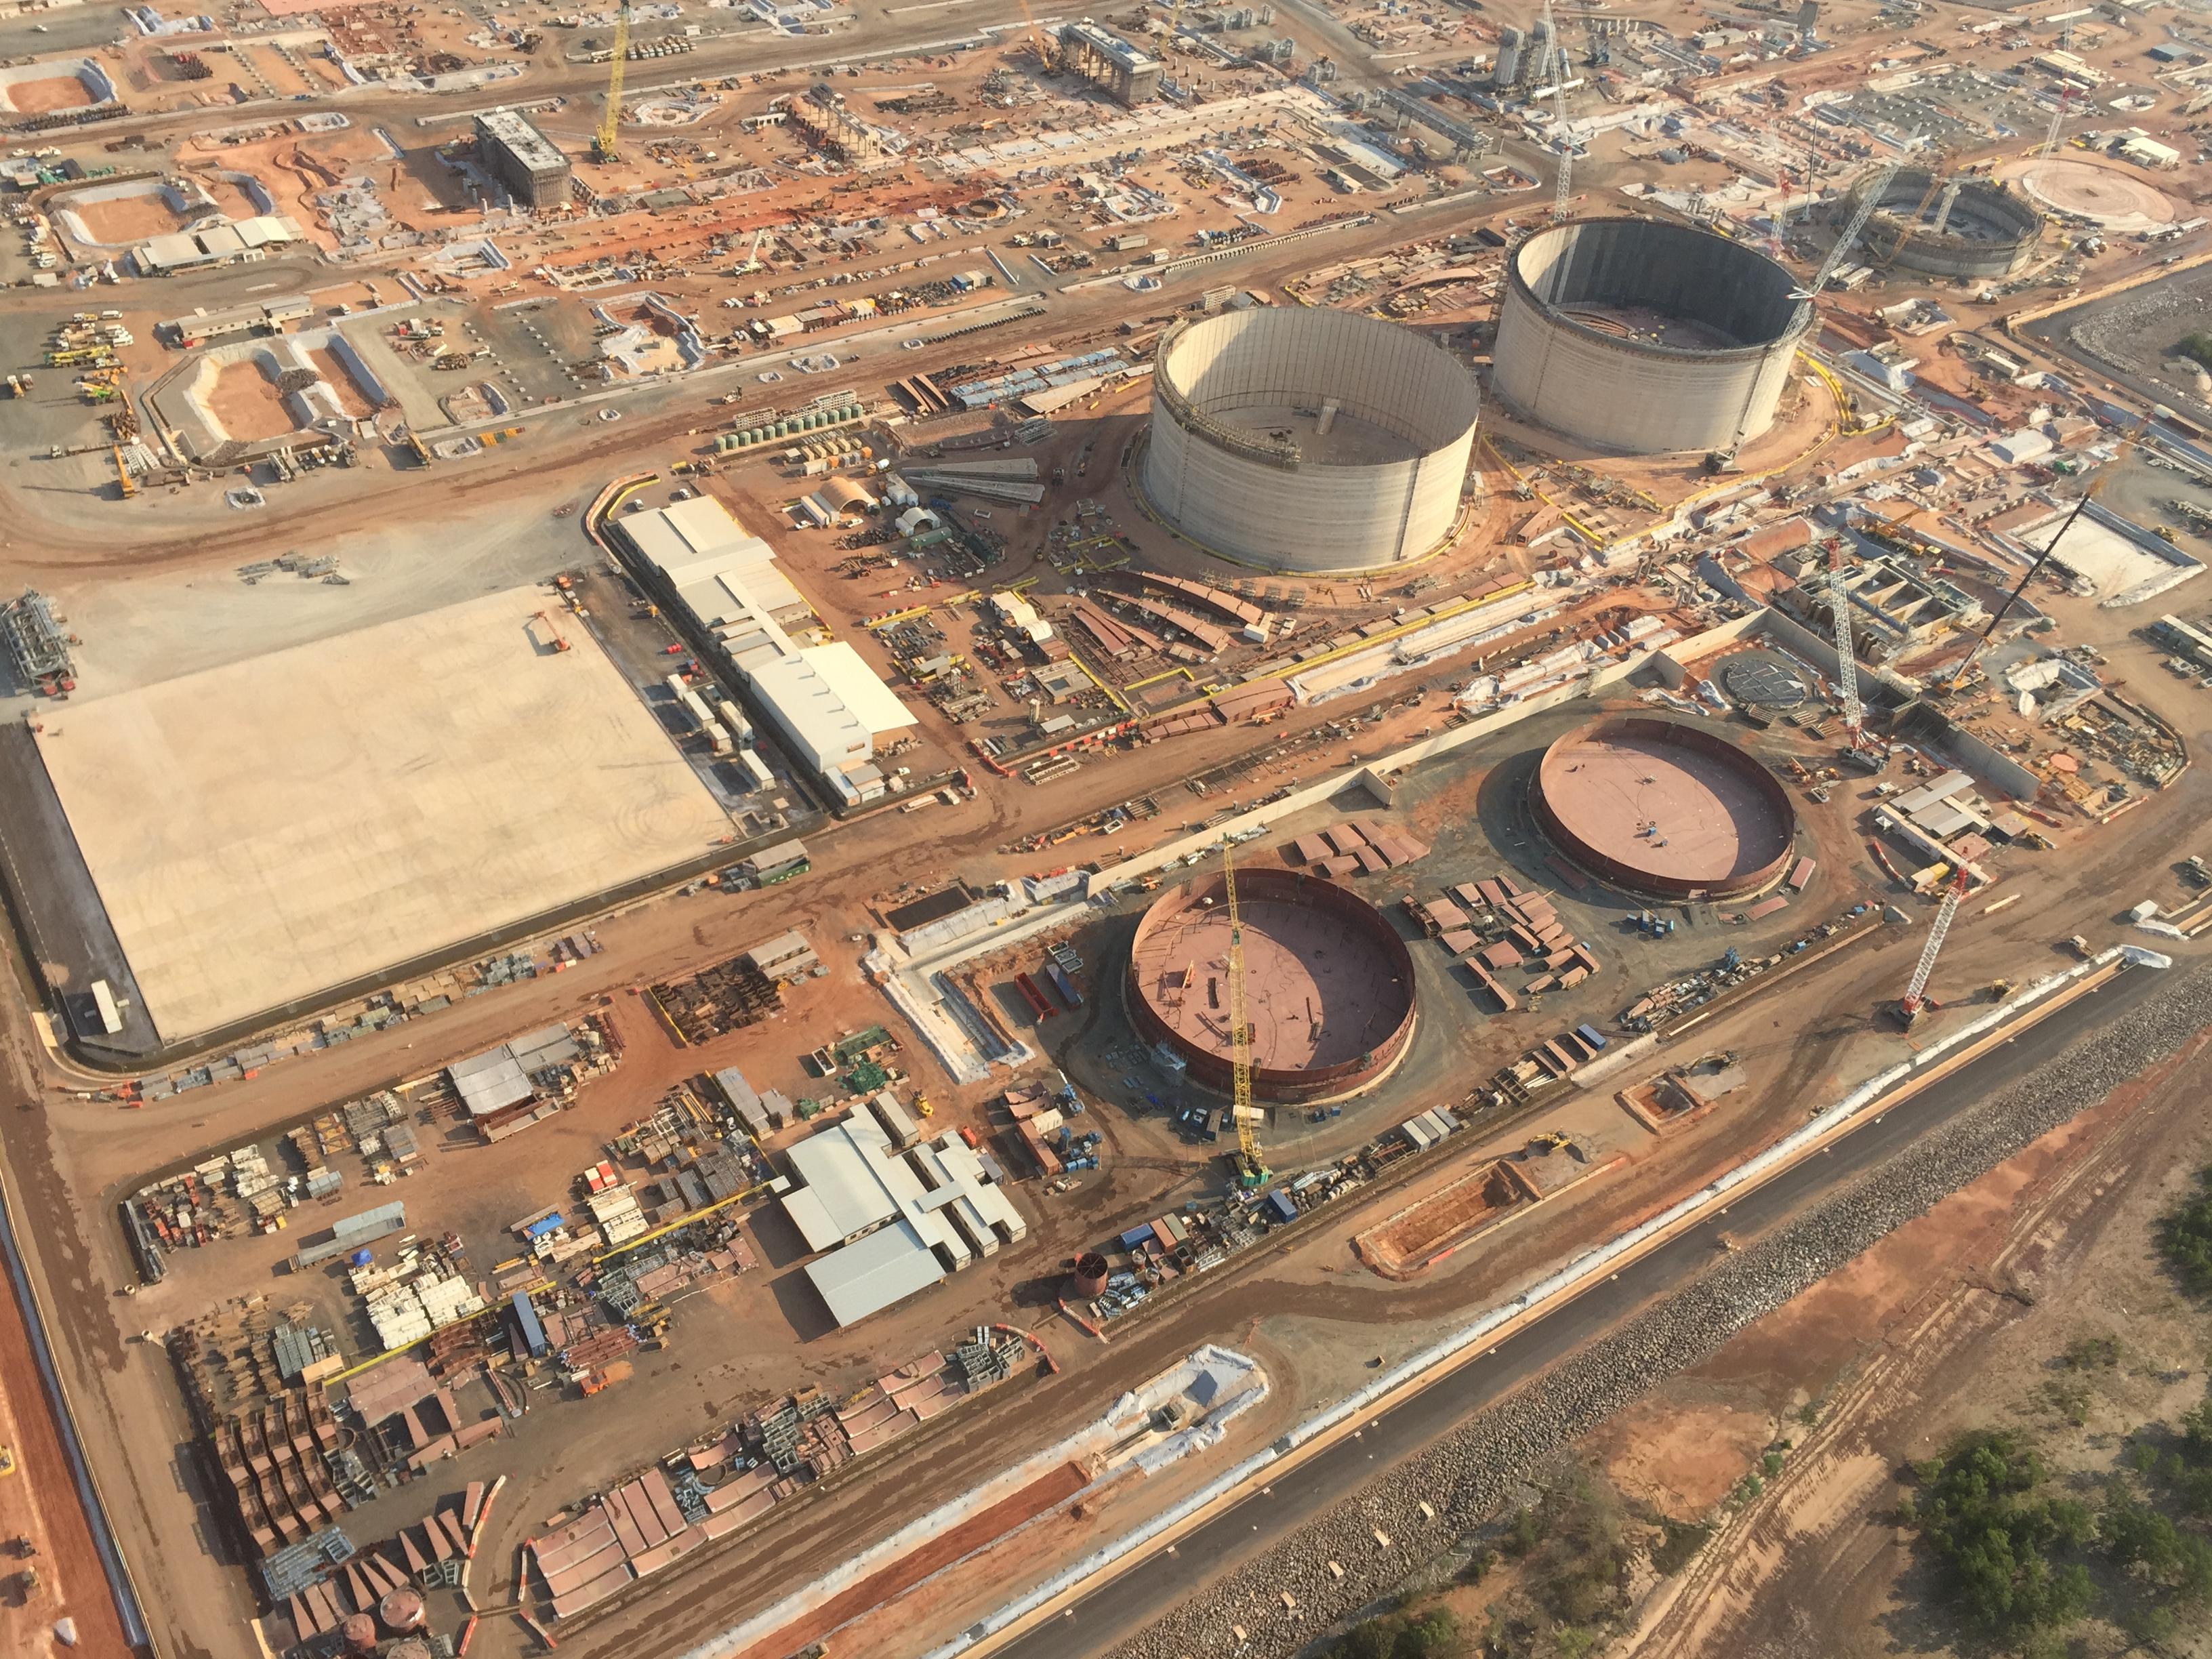 LNG storage tanks under construction.